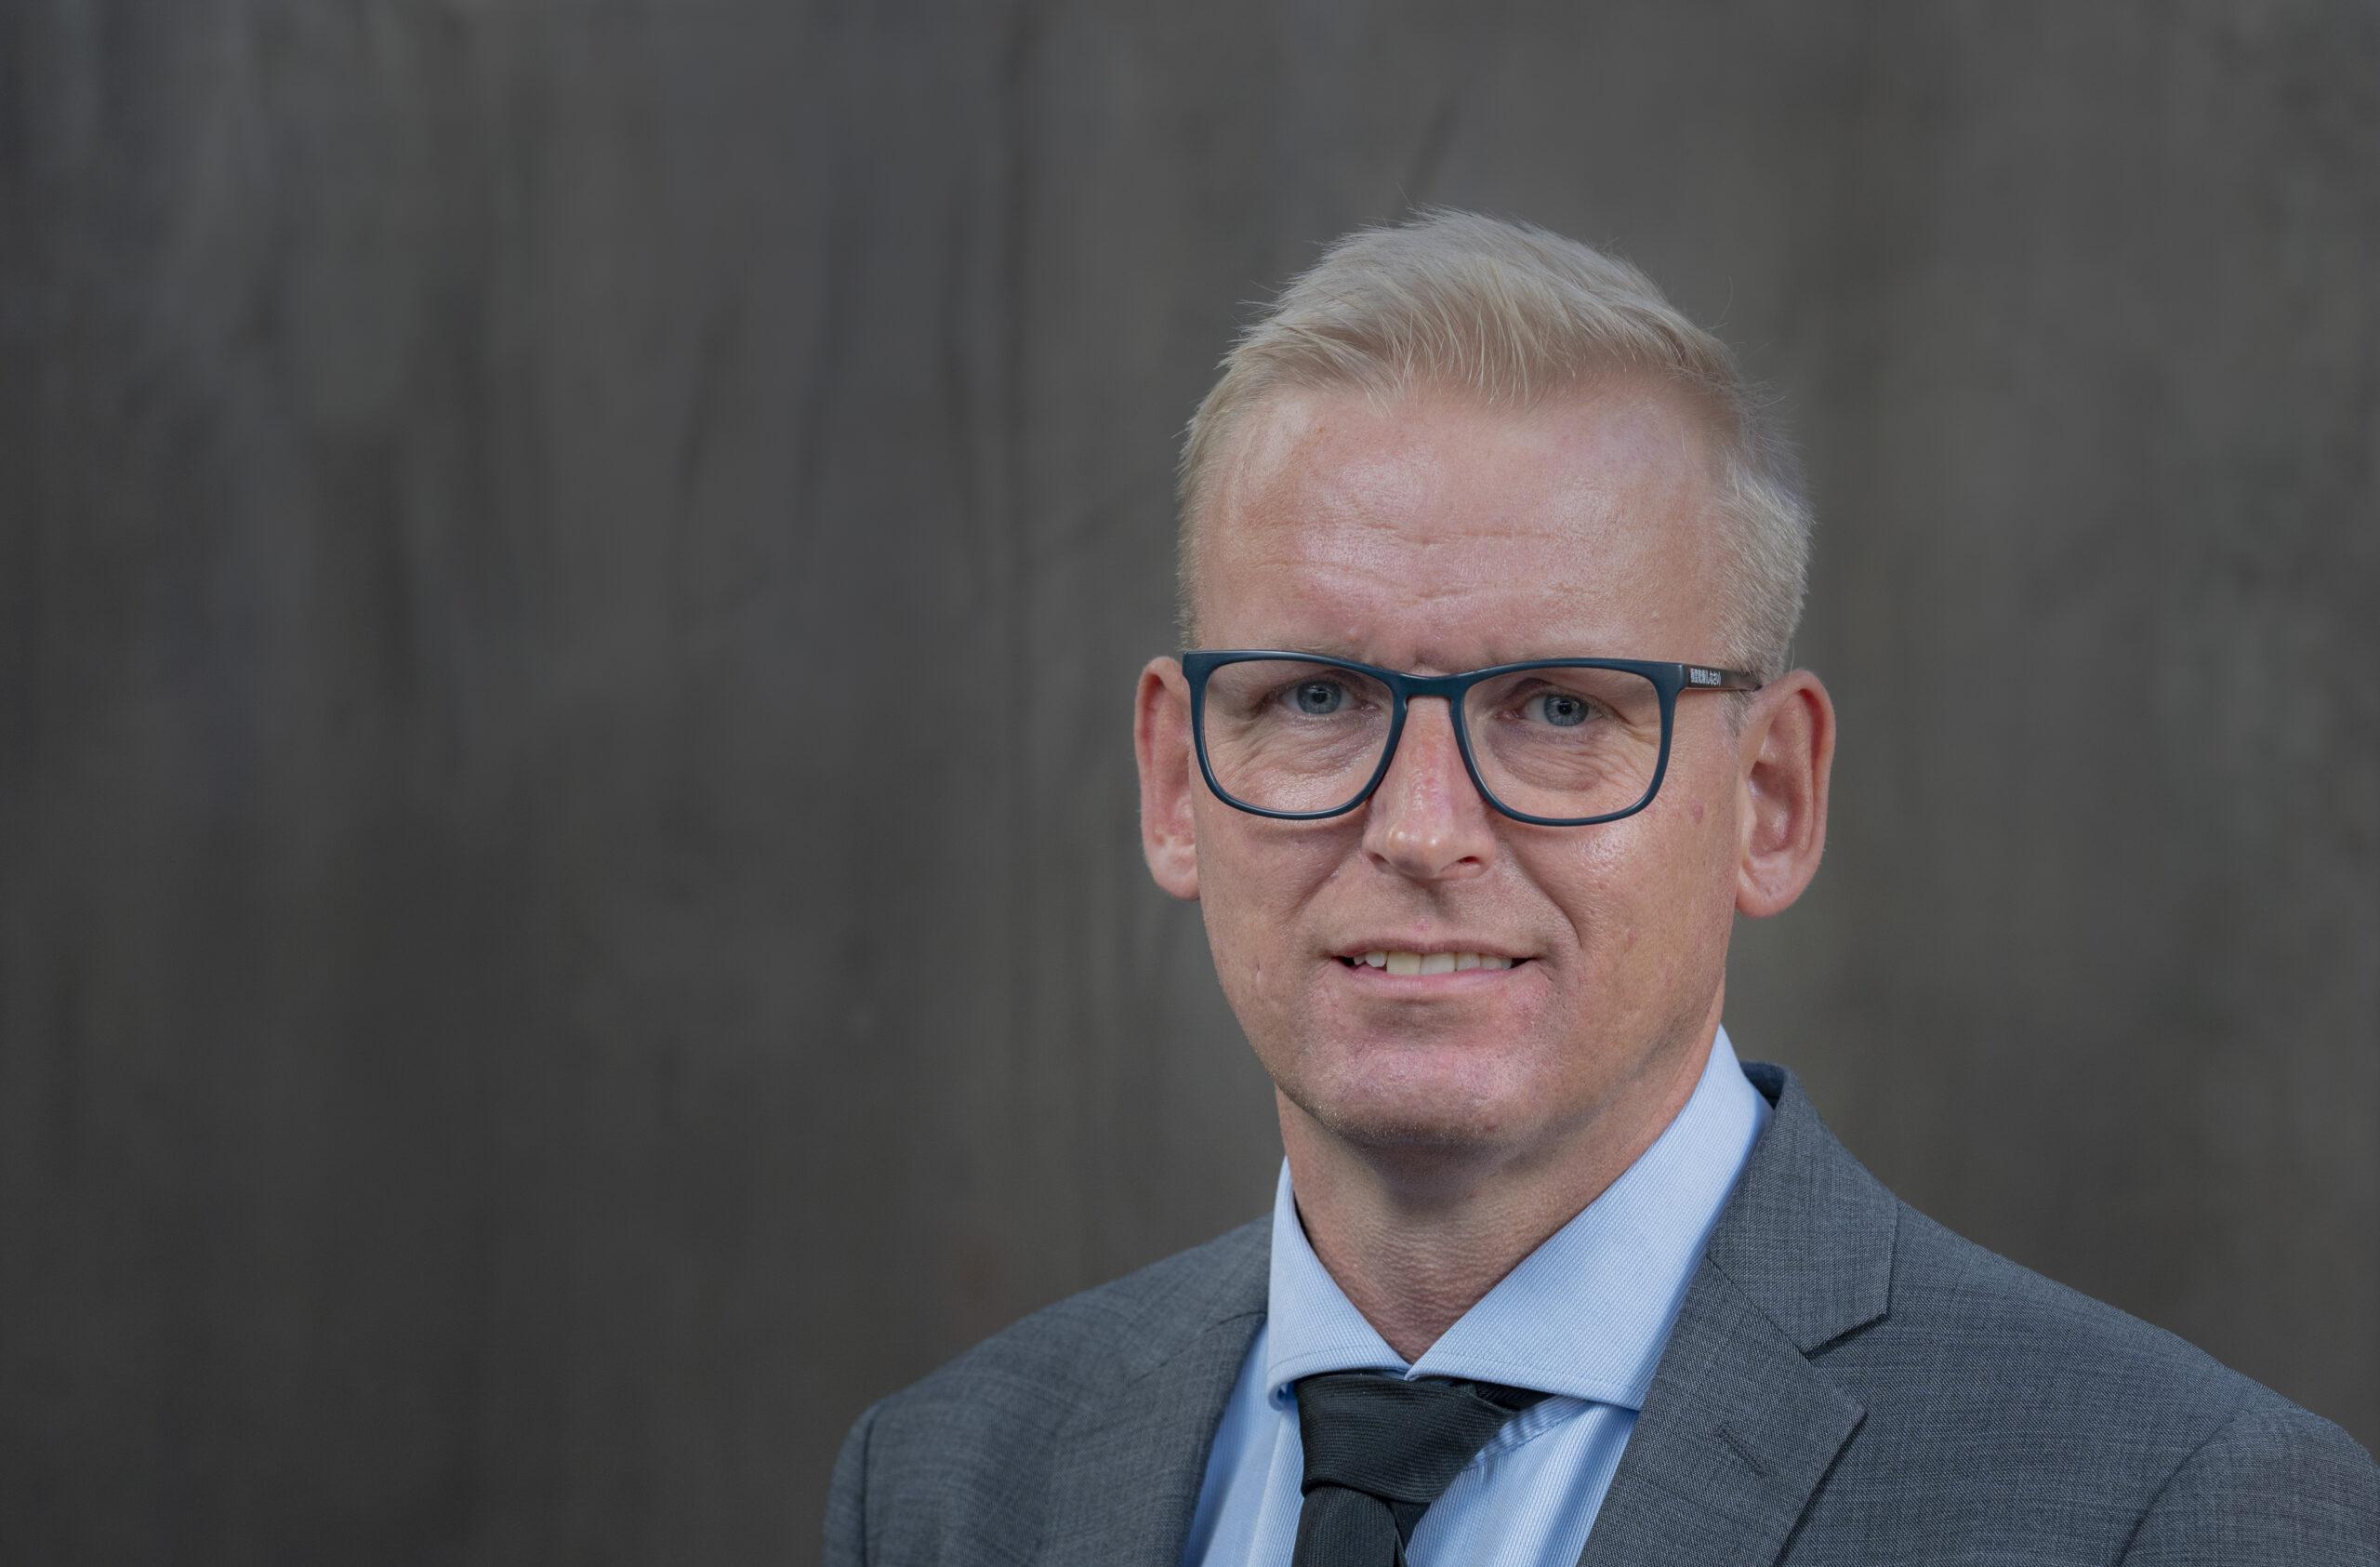 Fredericias nye borgmester melder klar